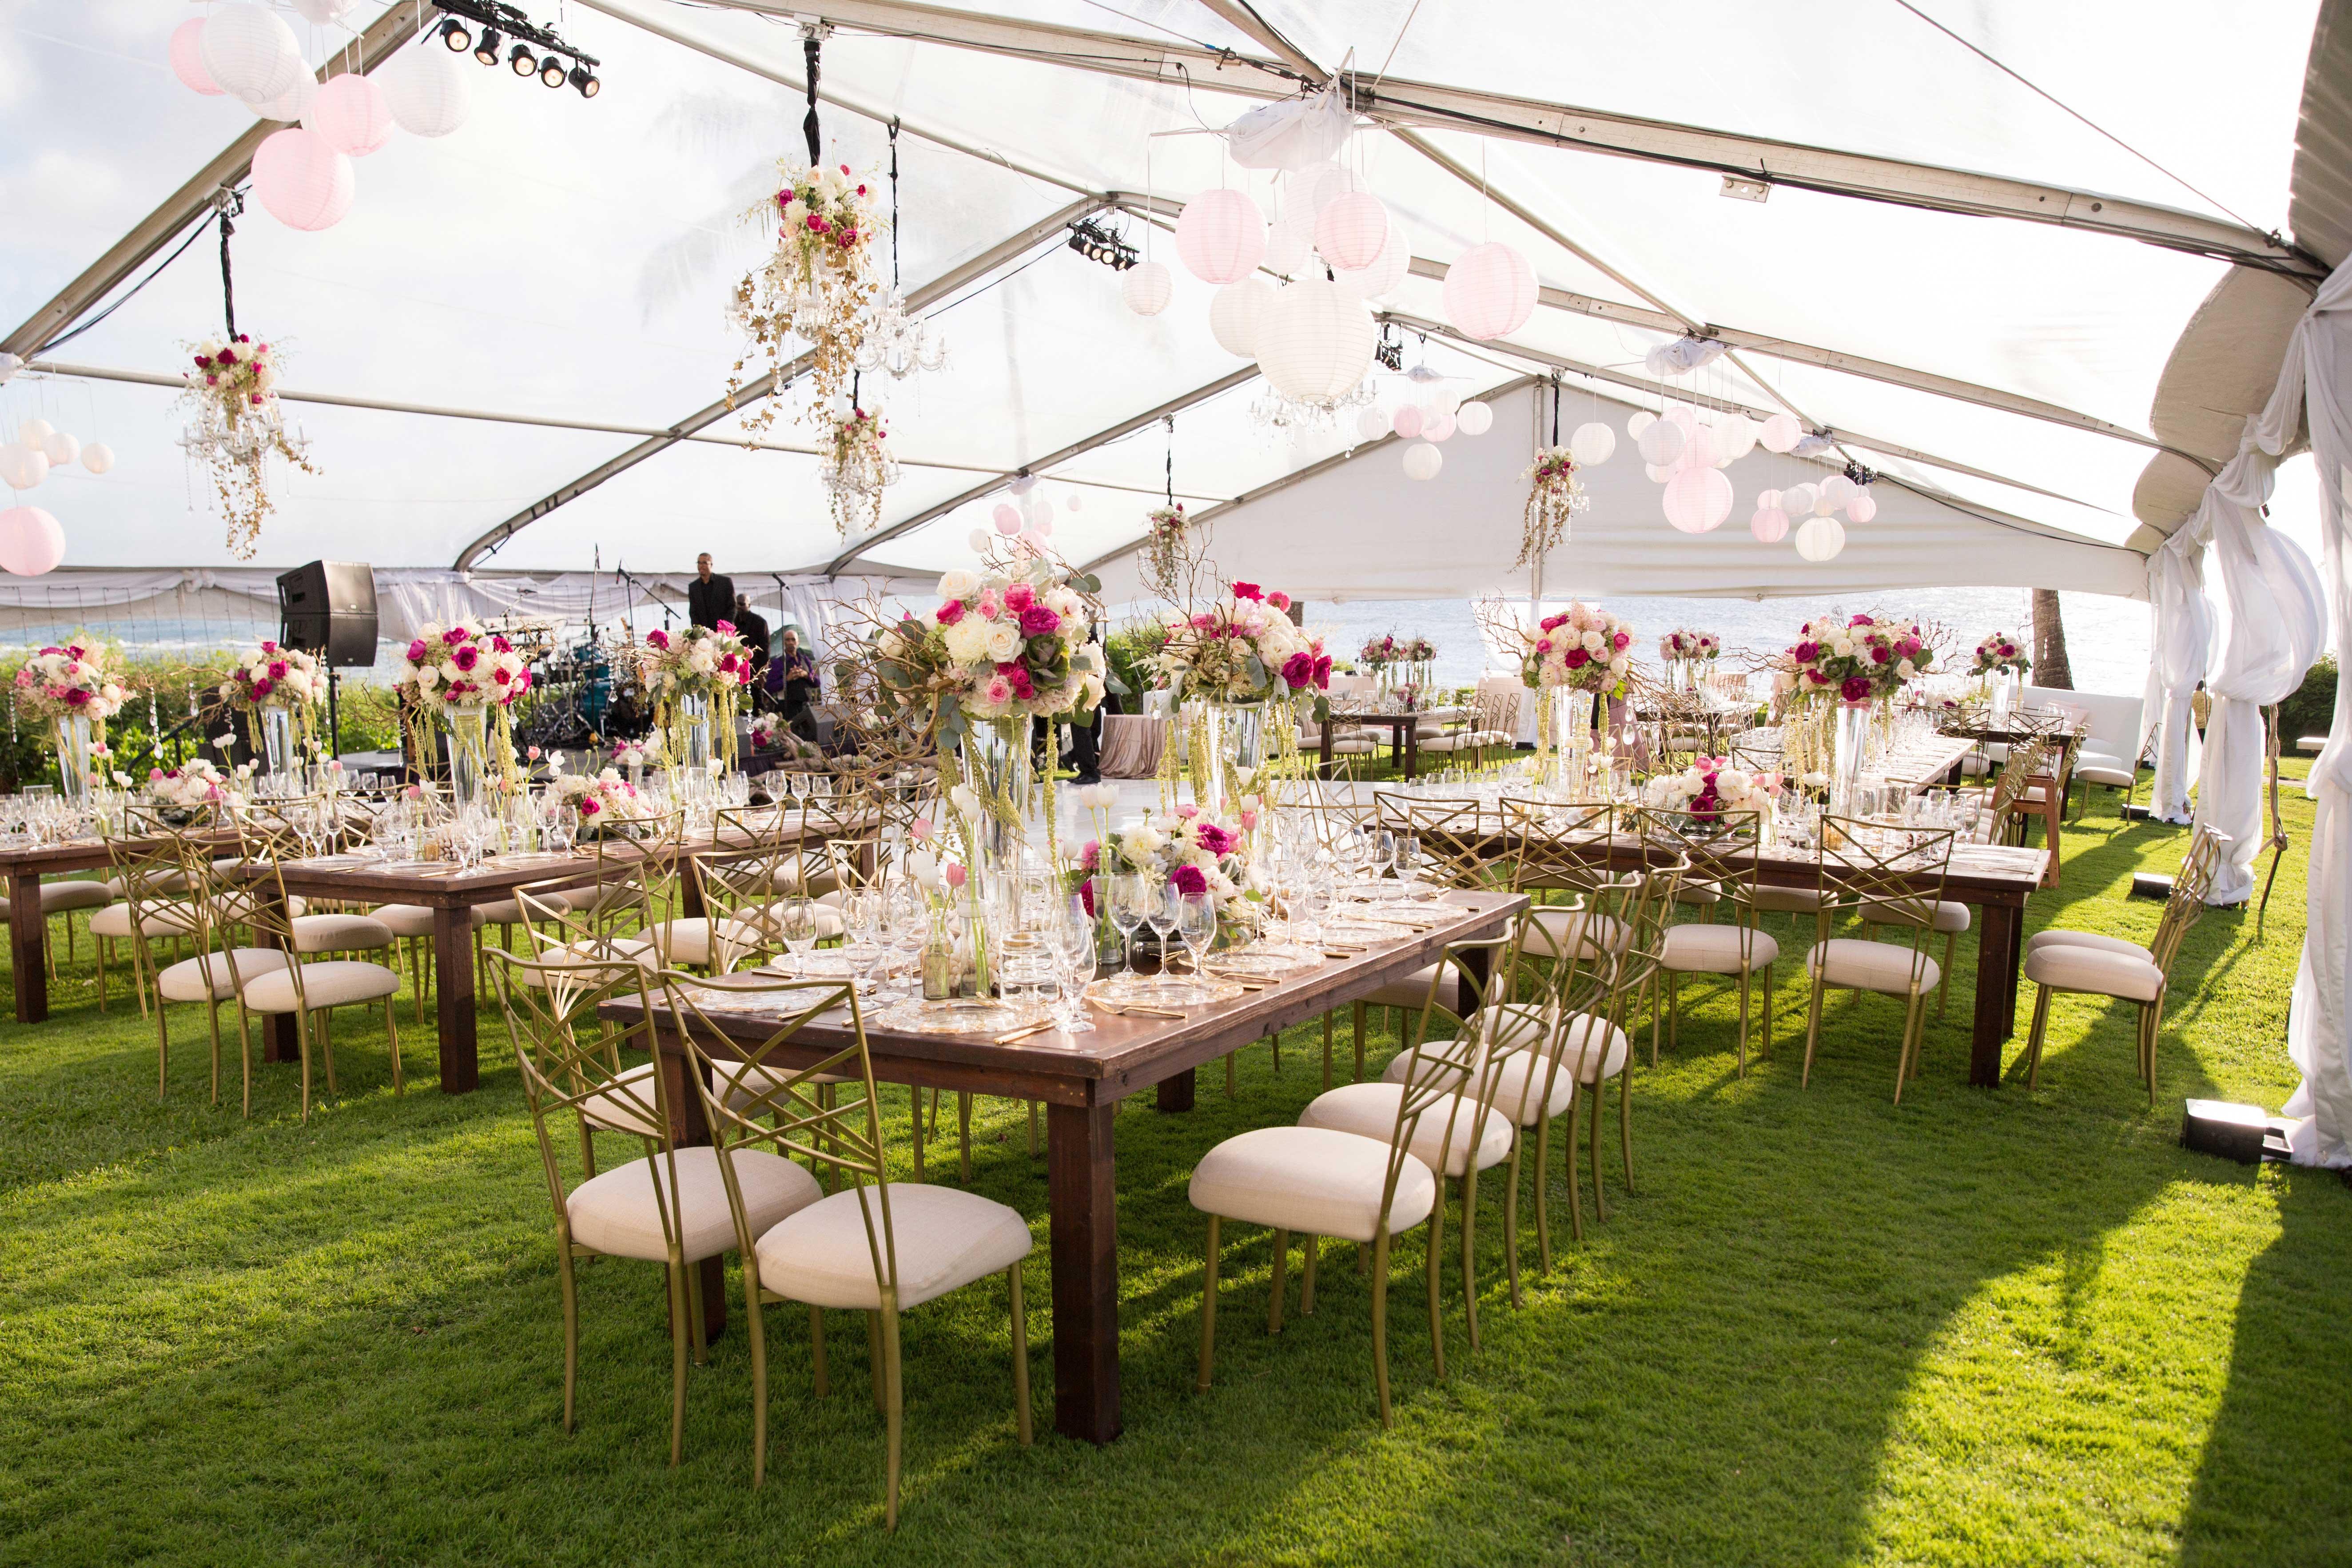 Wedding Ideas & Trends: Clear-Top Wedding Tents